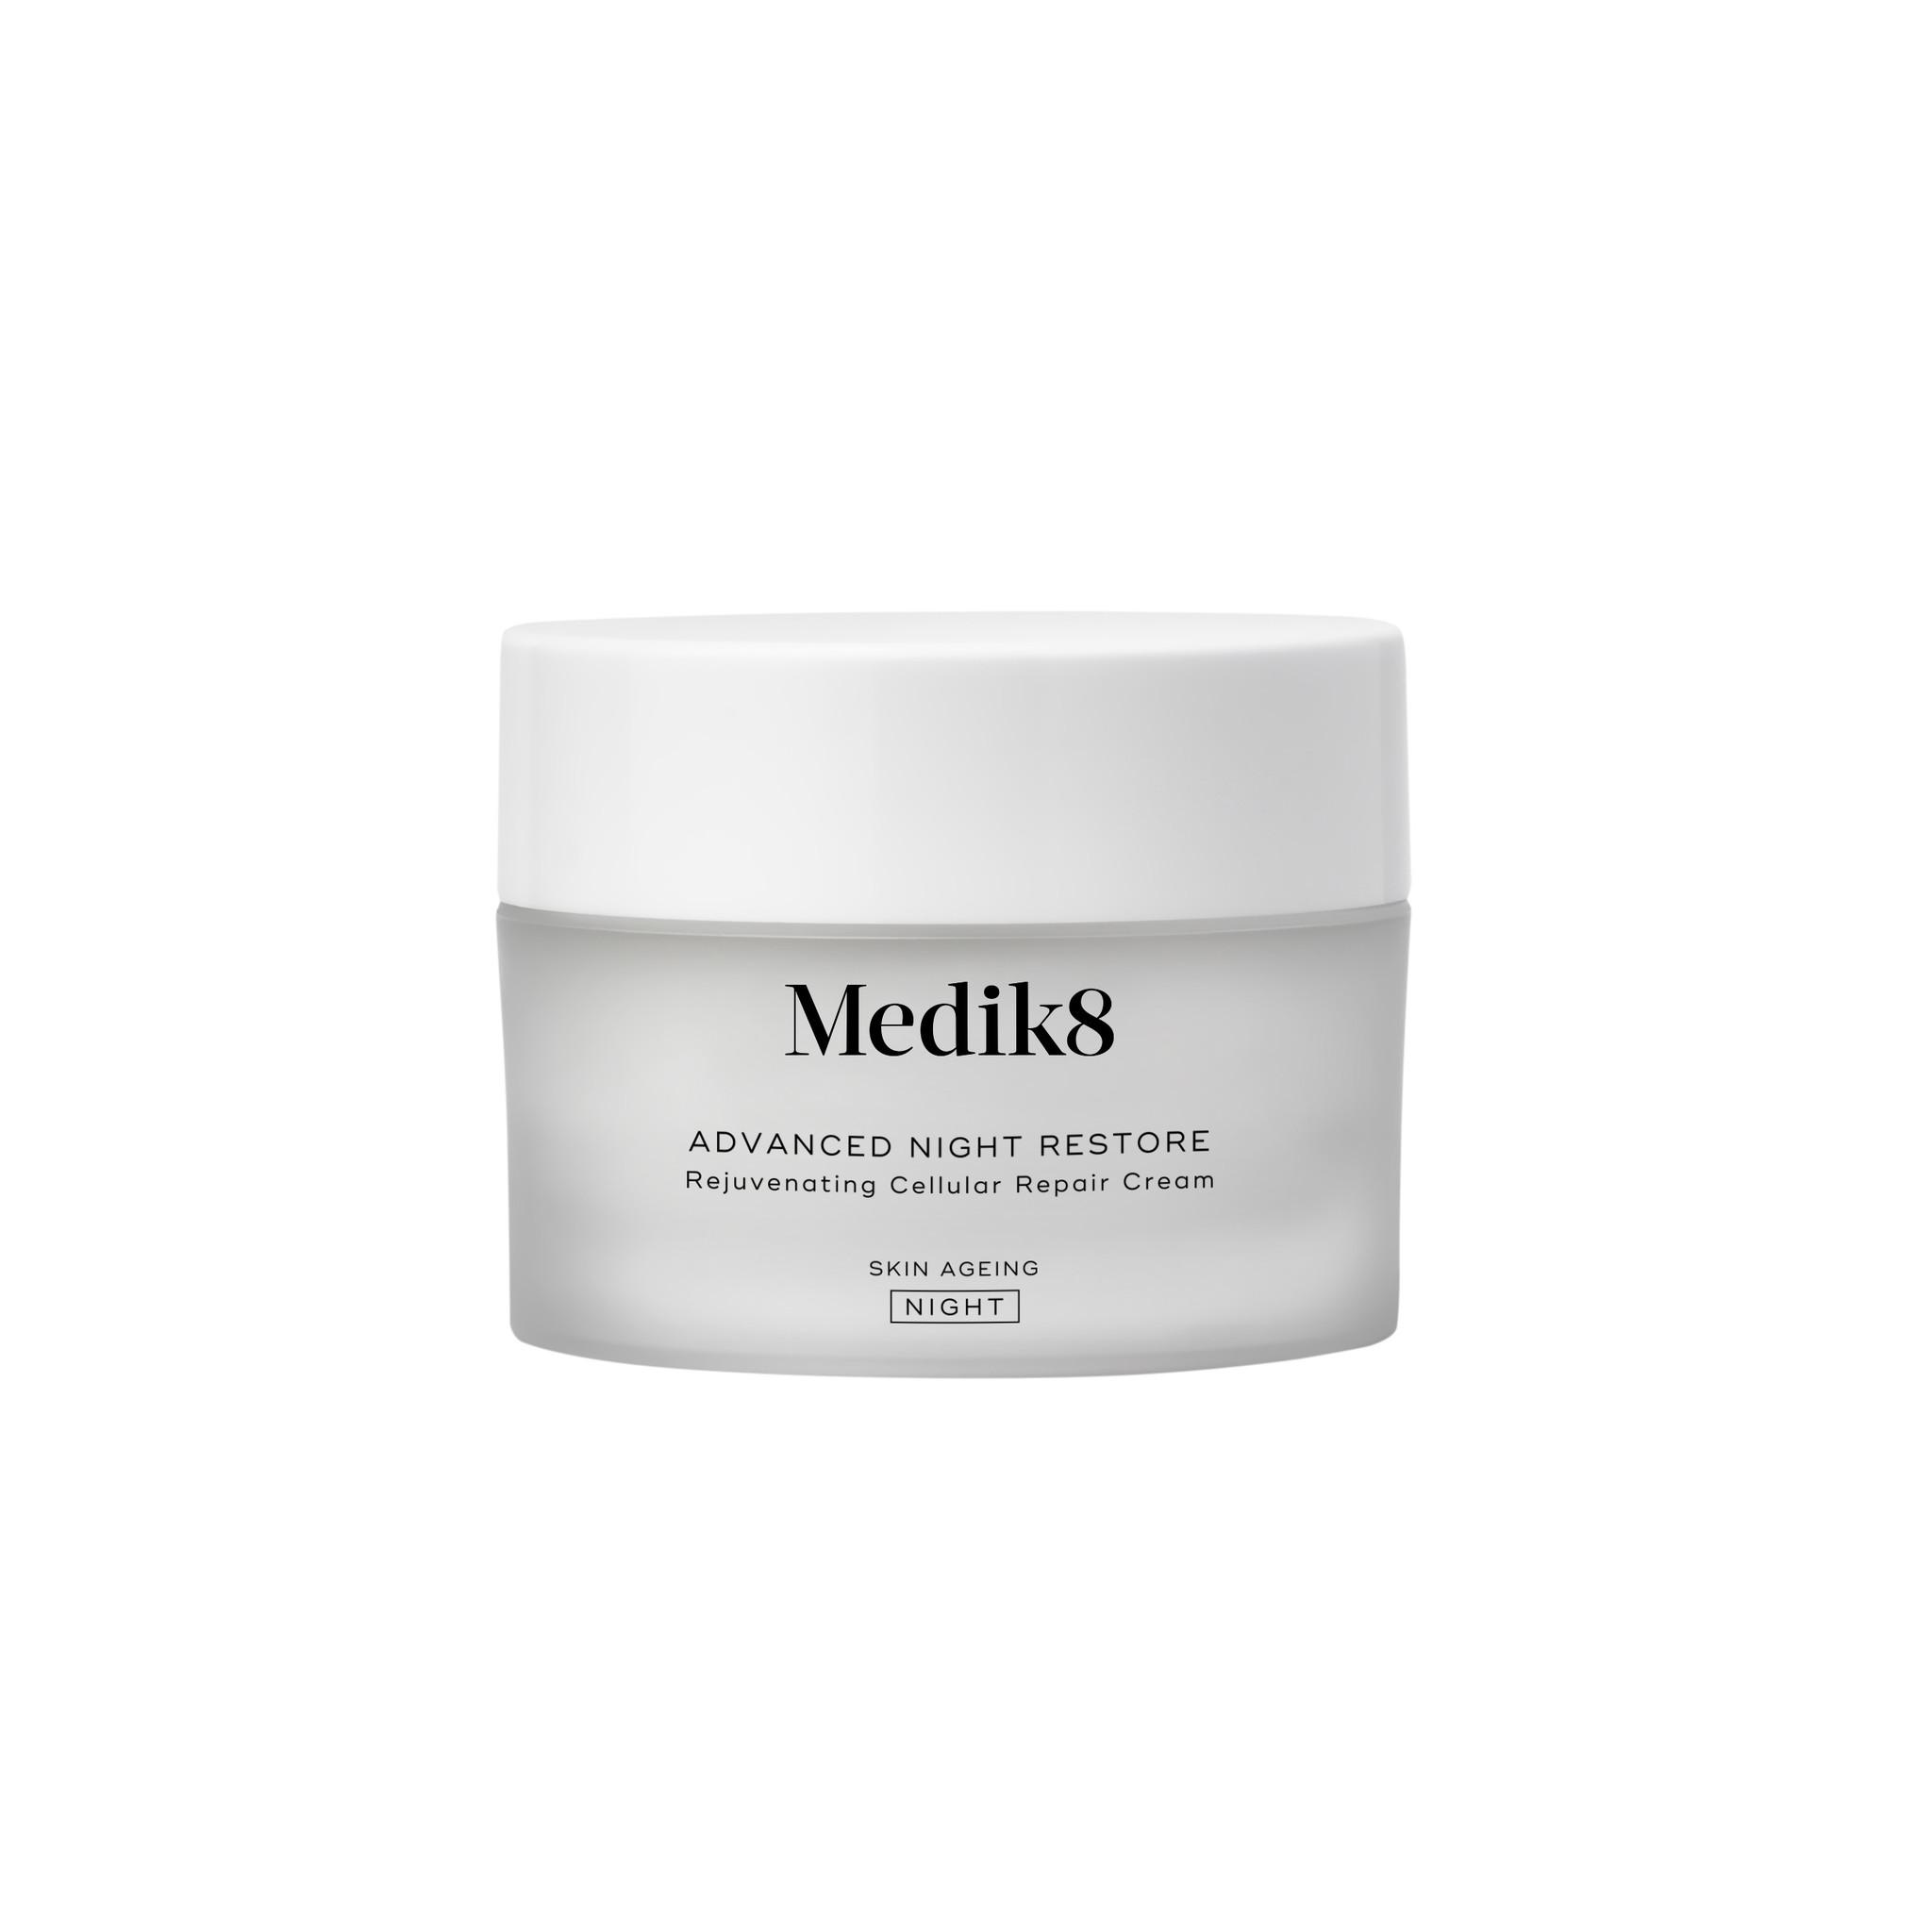 Medik8 Advanced Night Restore | Rejuvenating Cellular Repair Cream